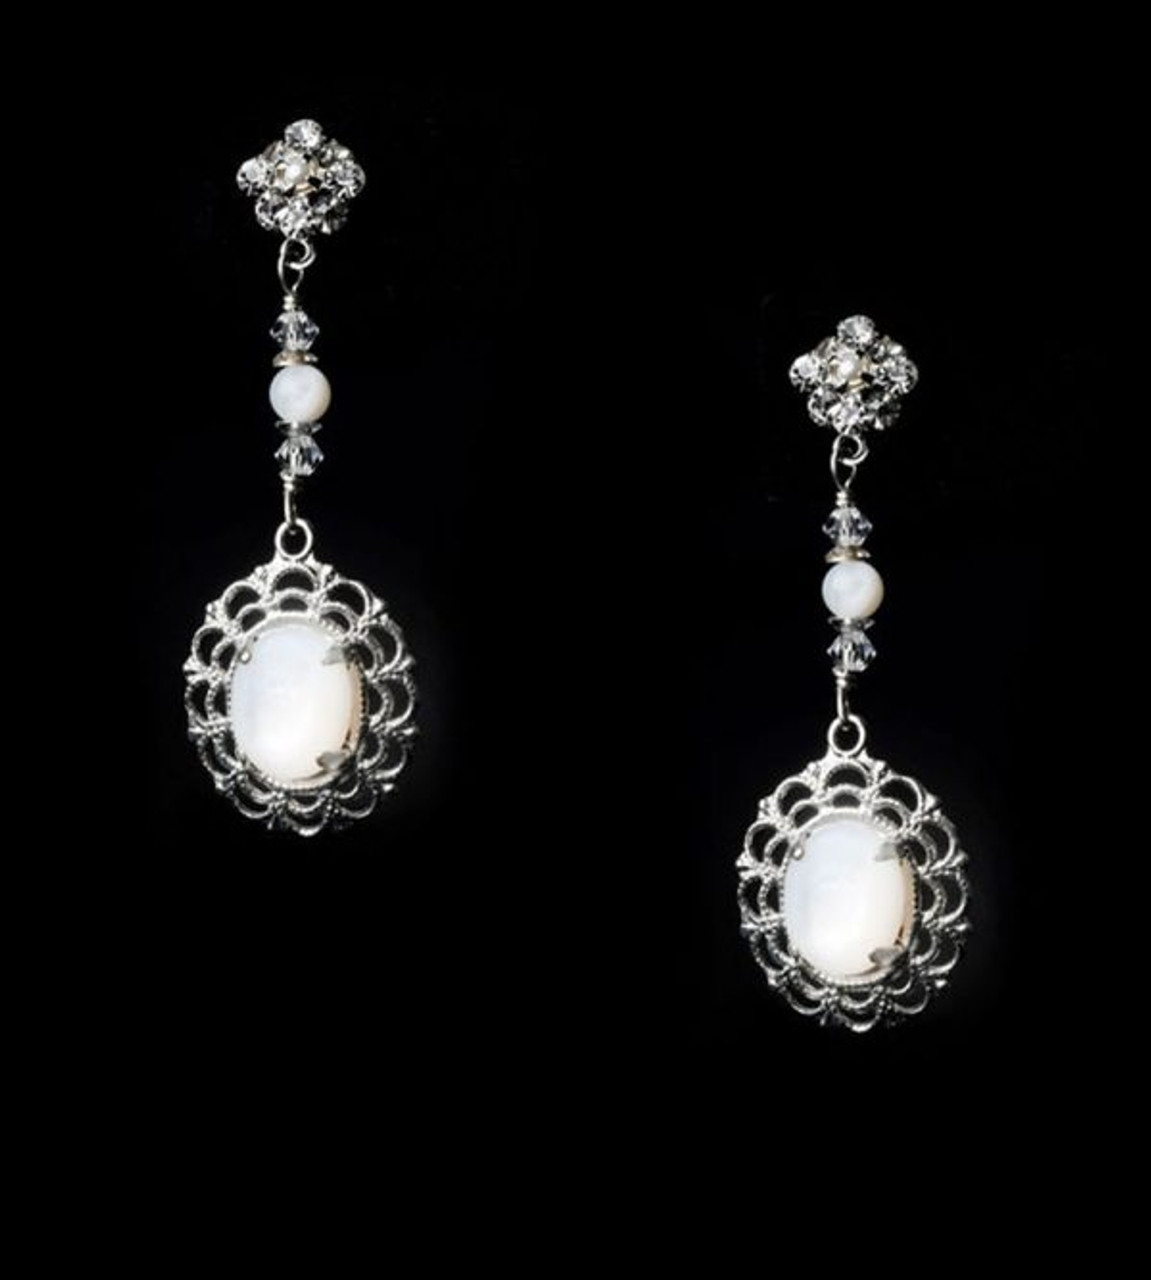 Erica Koesler Earring - Style J-9469